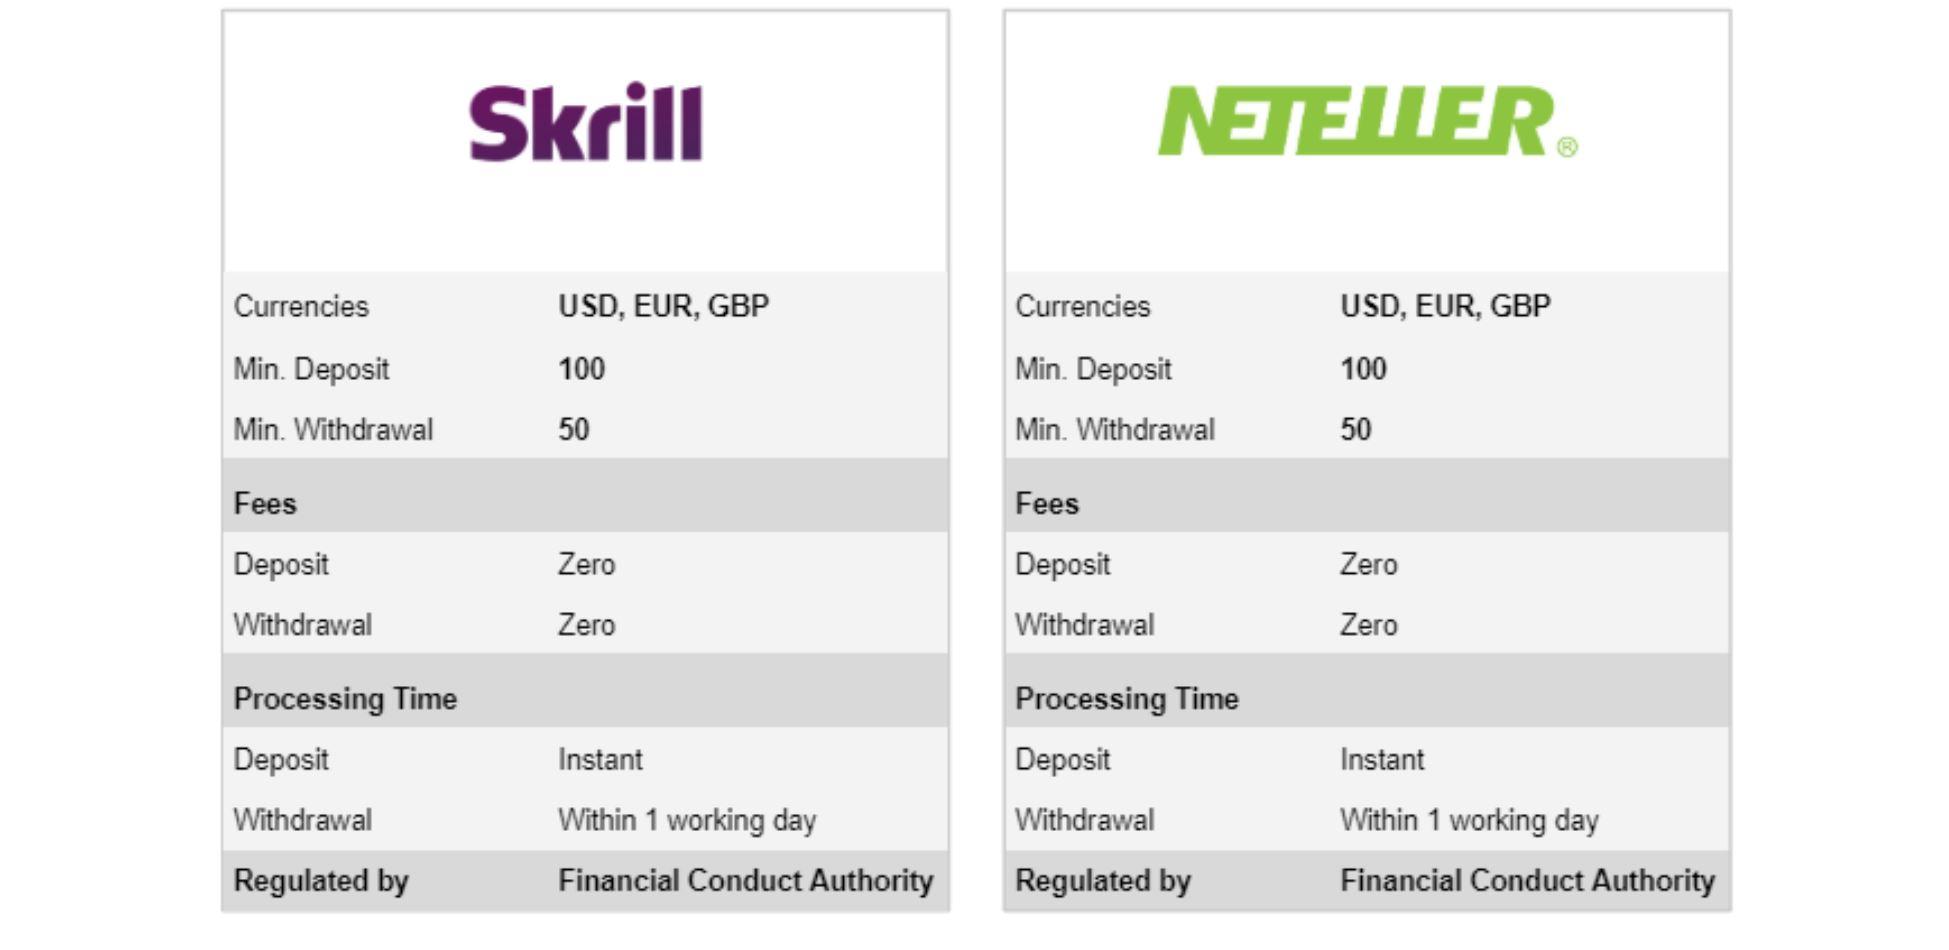 Skilling payment methods - Skrill and Neteller